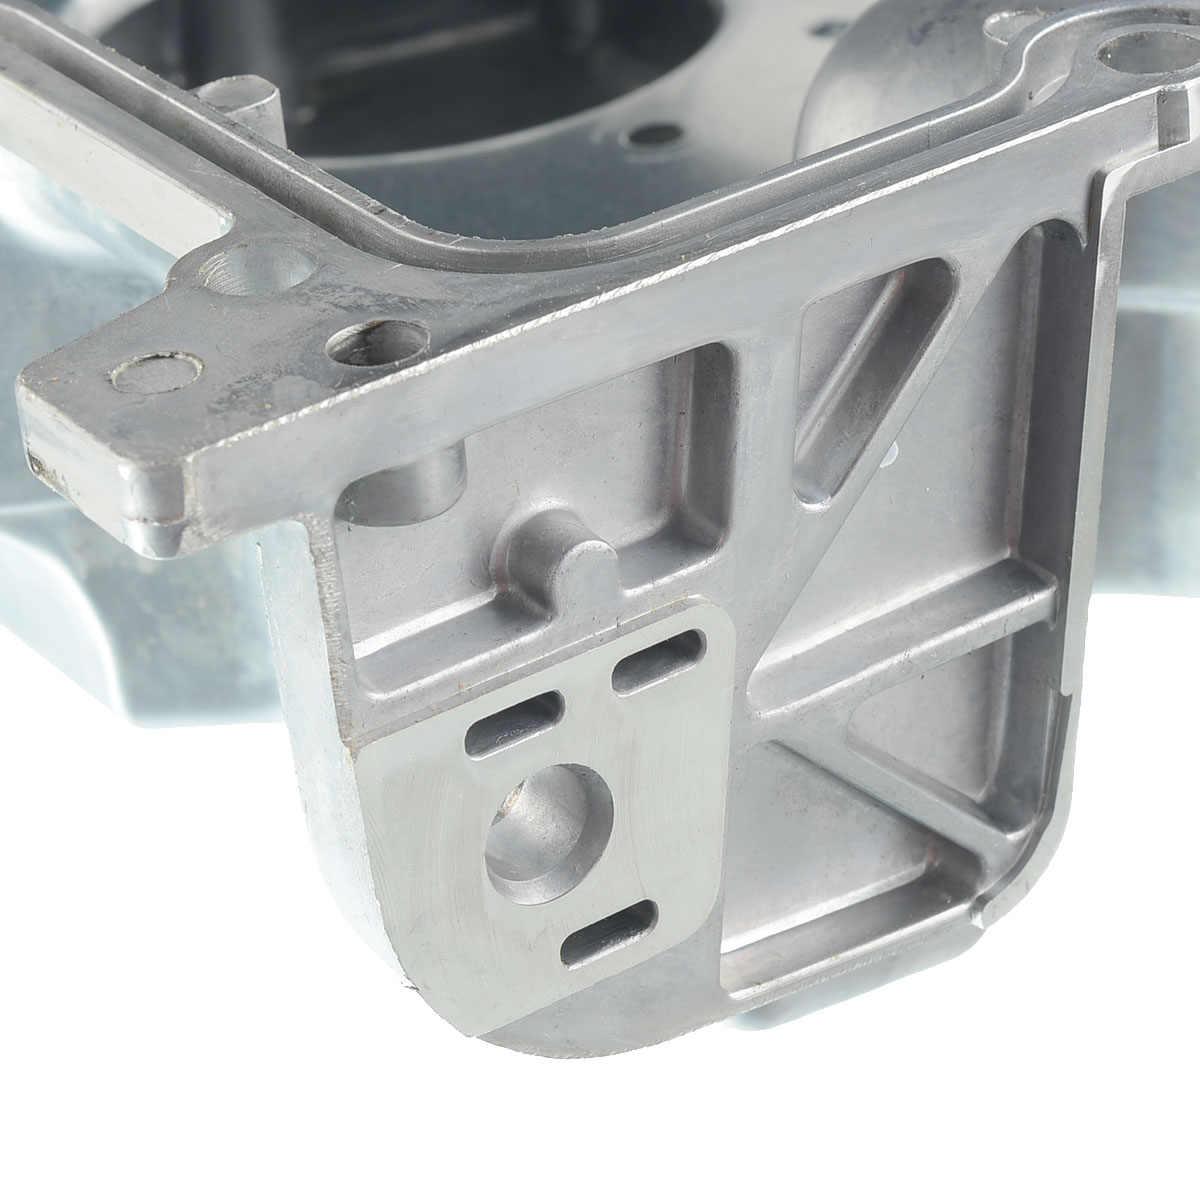 small resolution of  engine oil pan for ford escape cougar mariner mazda 6 mpv tribute v6 2 5l 3 0